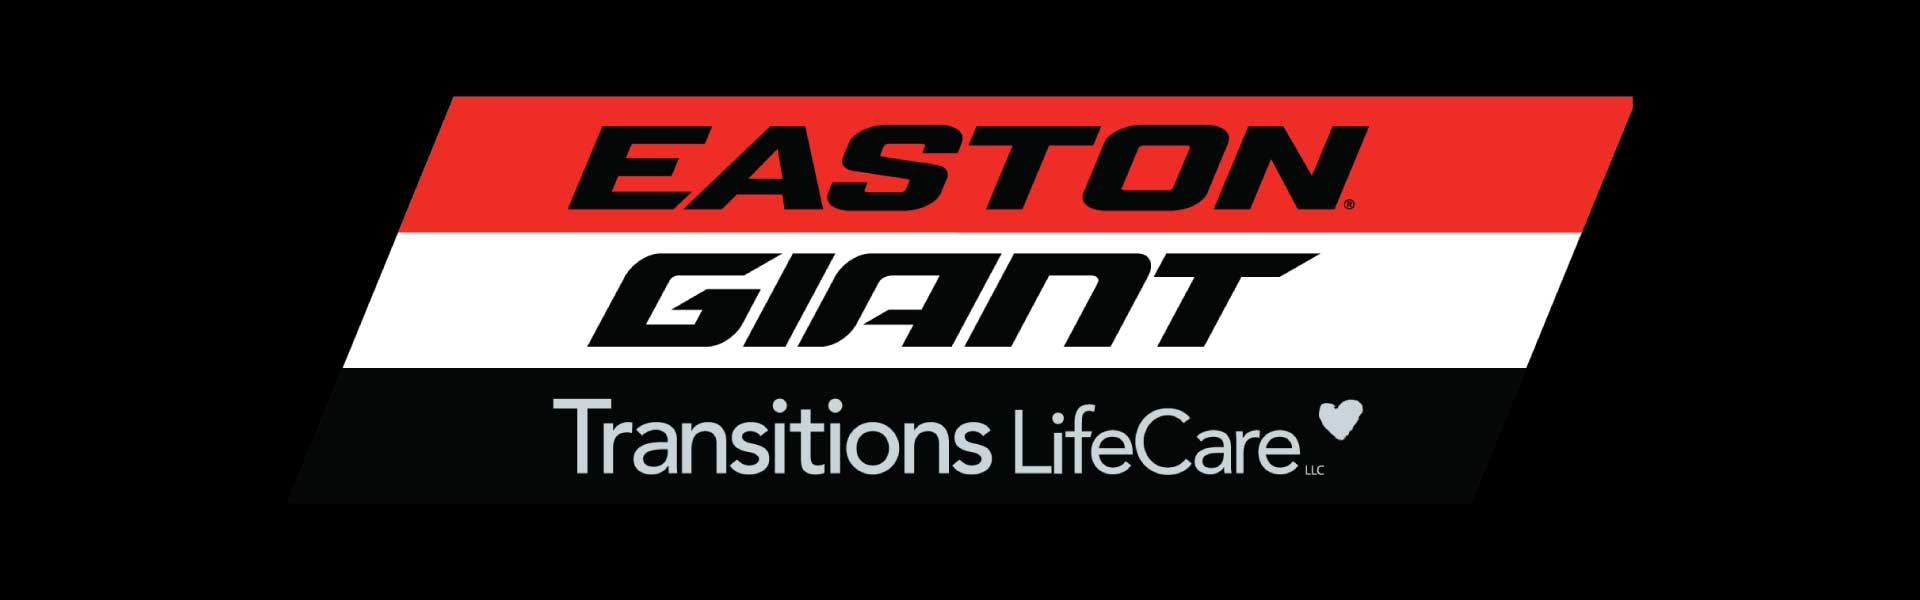 Easton-Giant p/b Transitions LifeCare